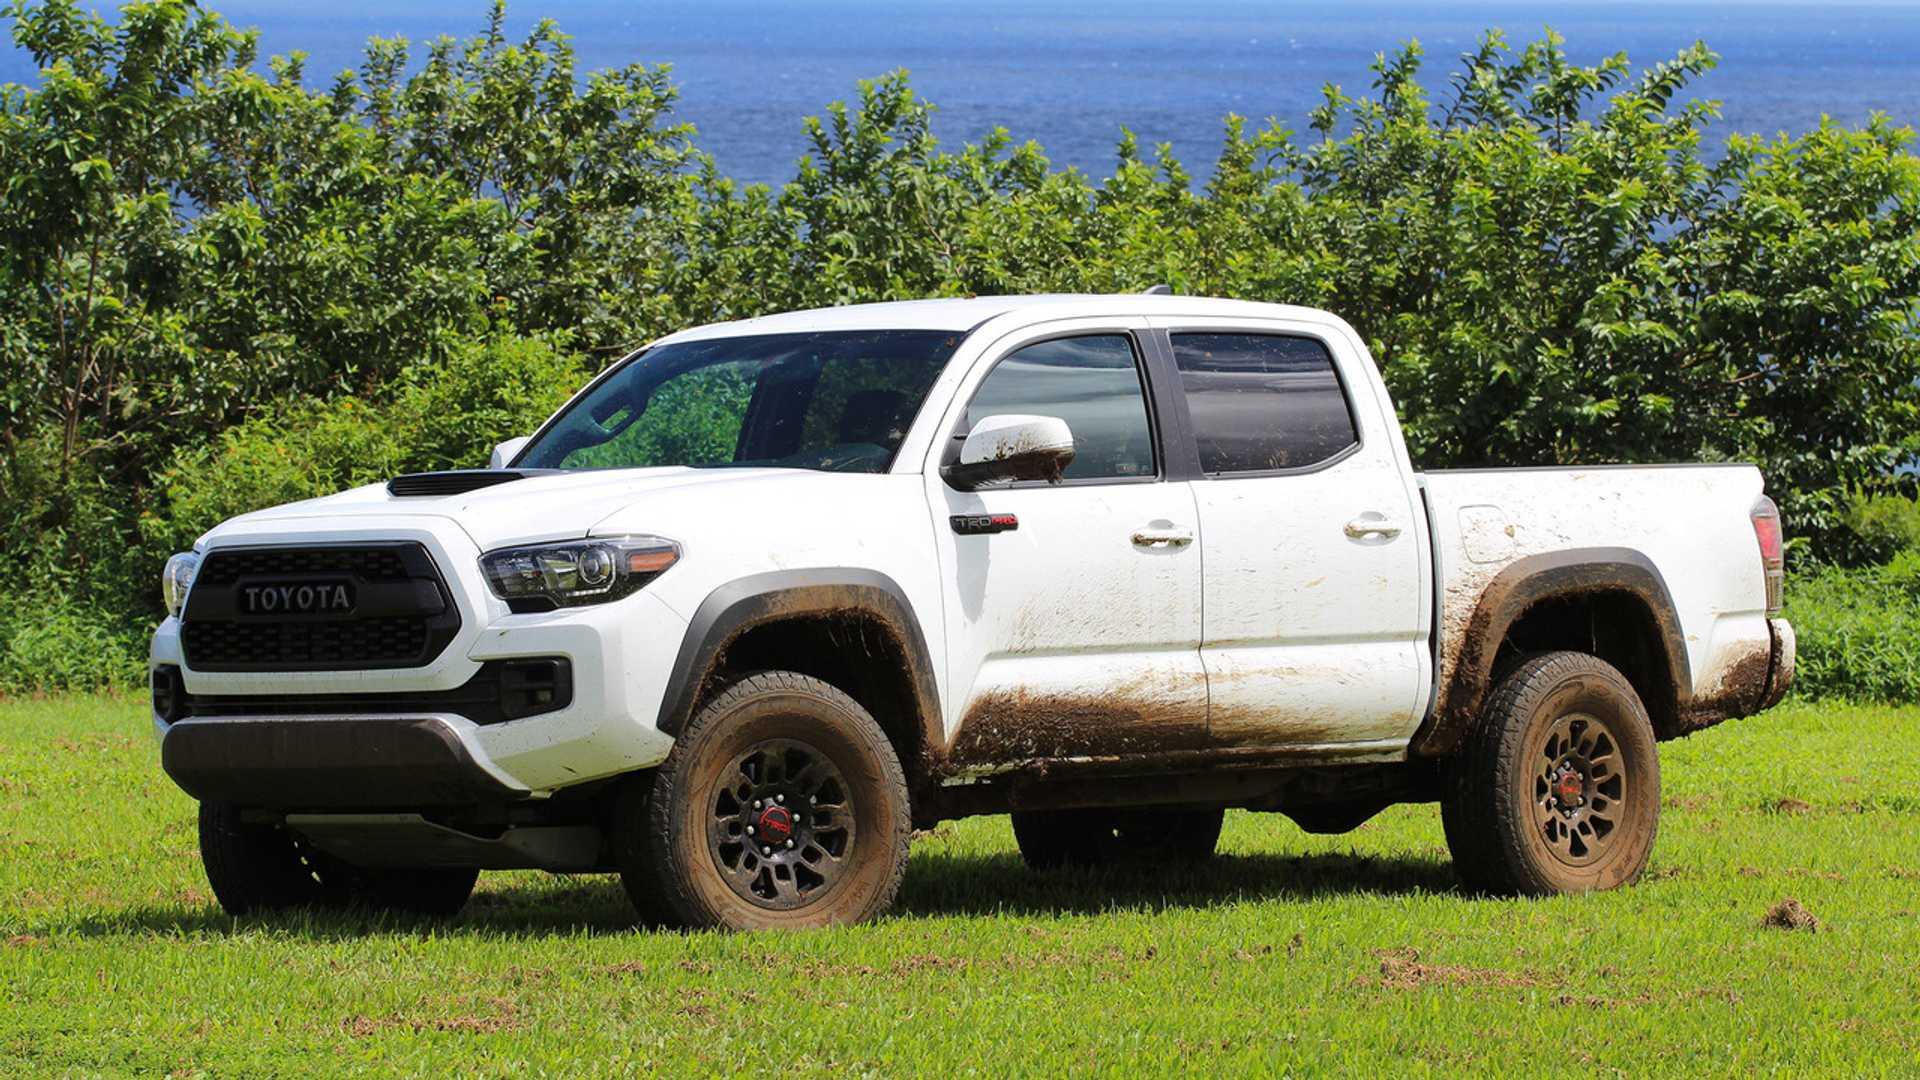 2017 Toyota Tacoma Trd Pro First Drive No Pavement Problem Pickup Starting Problems